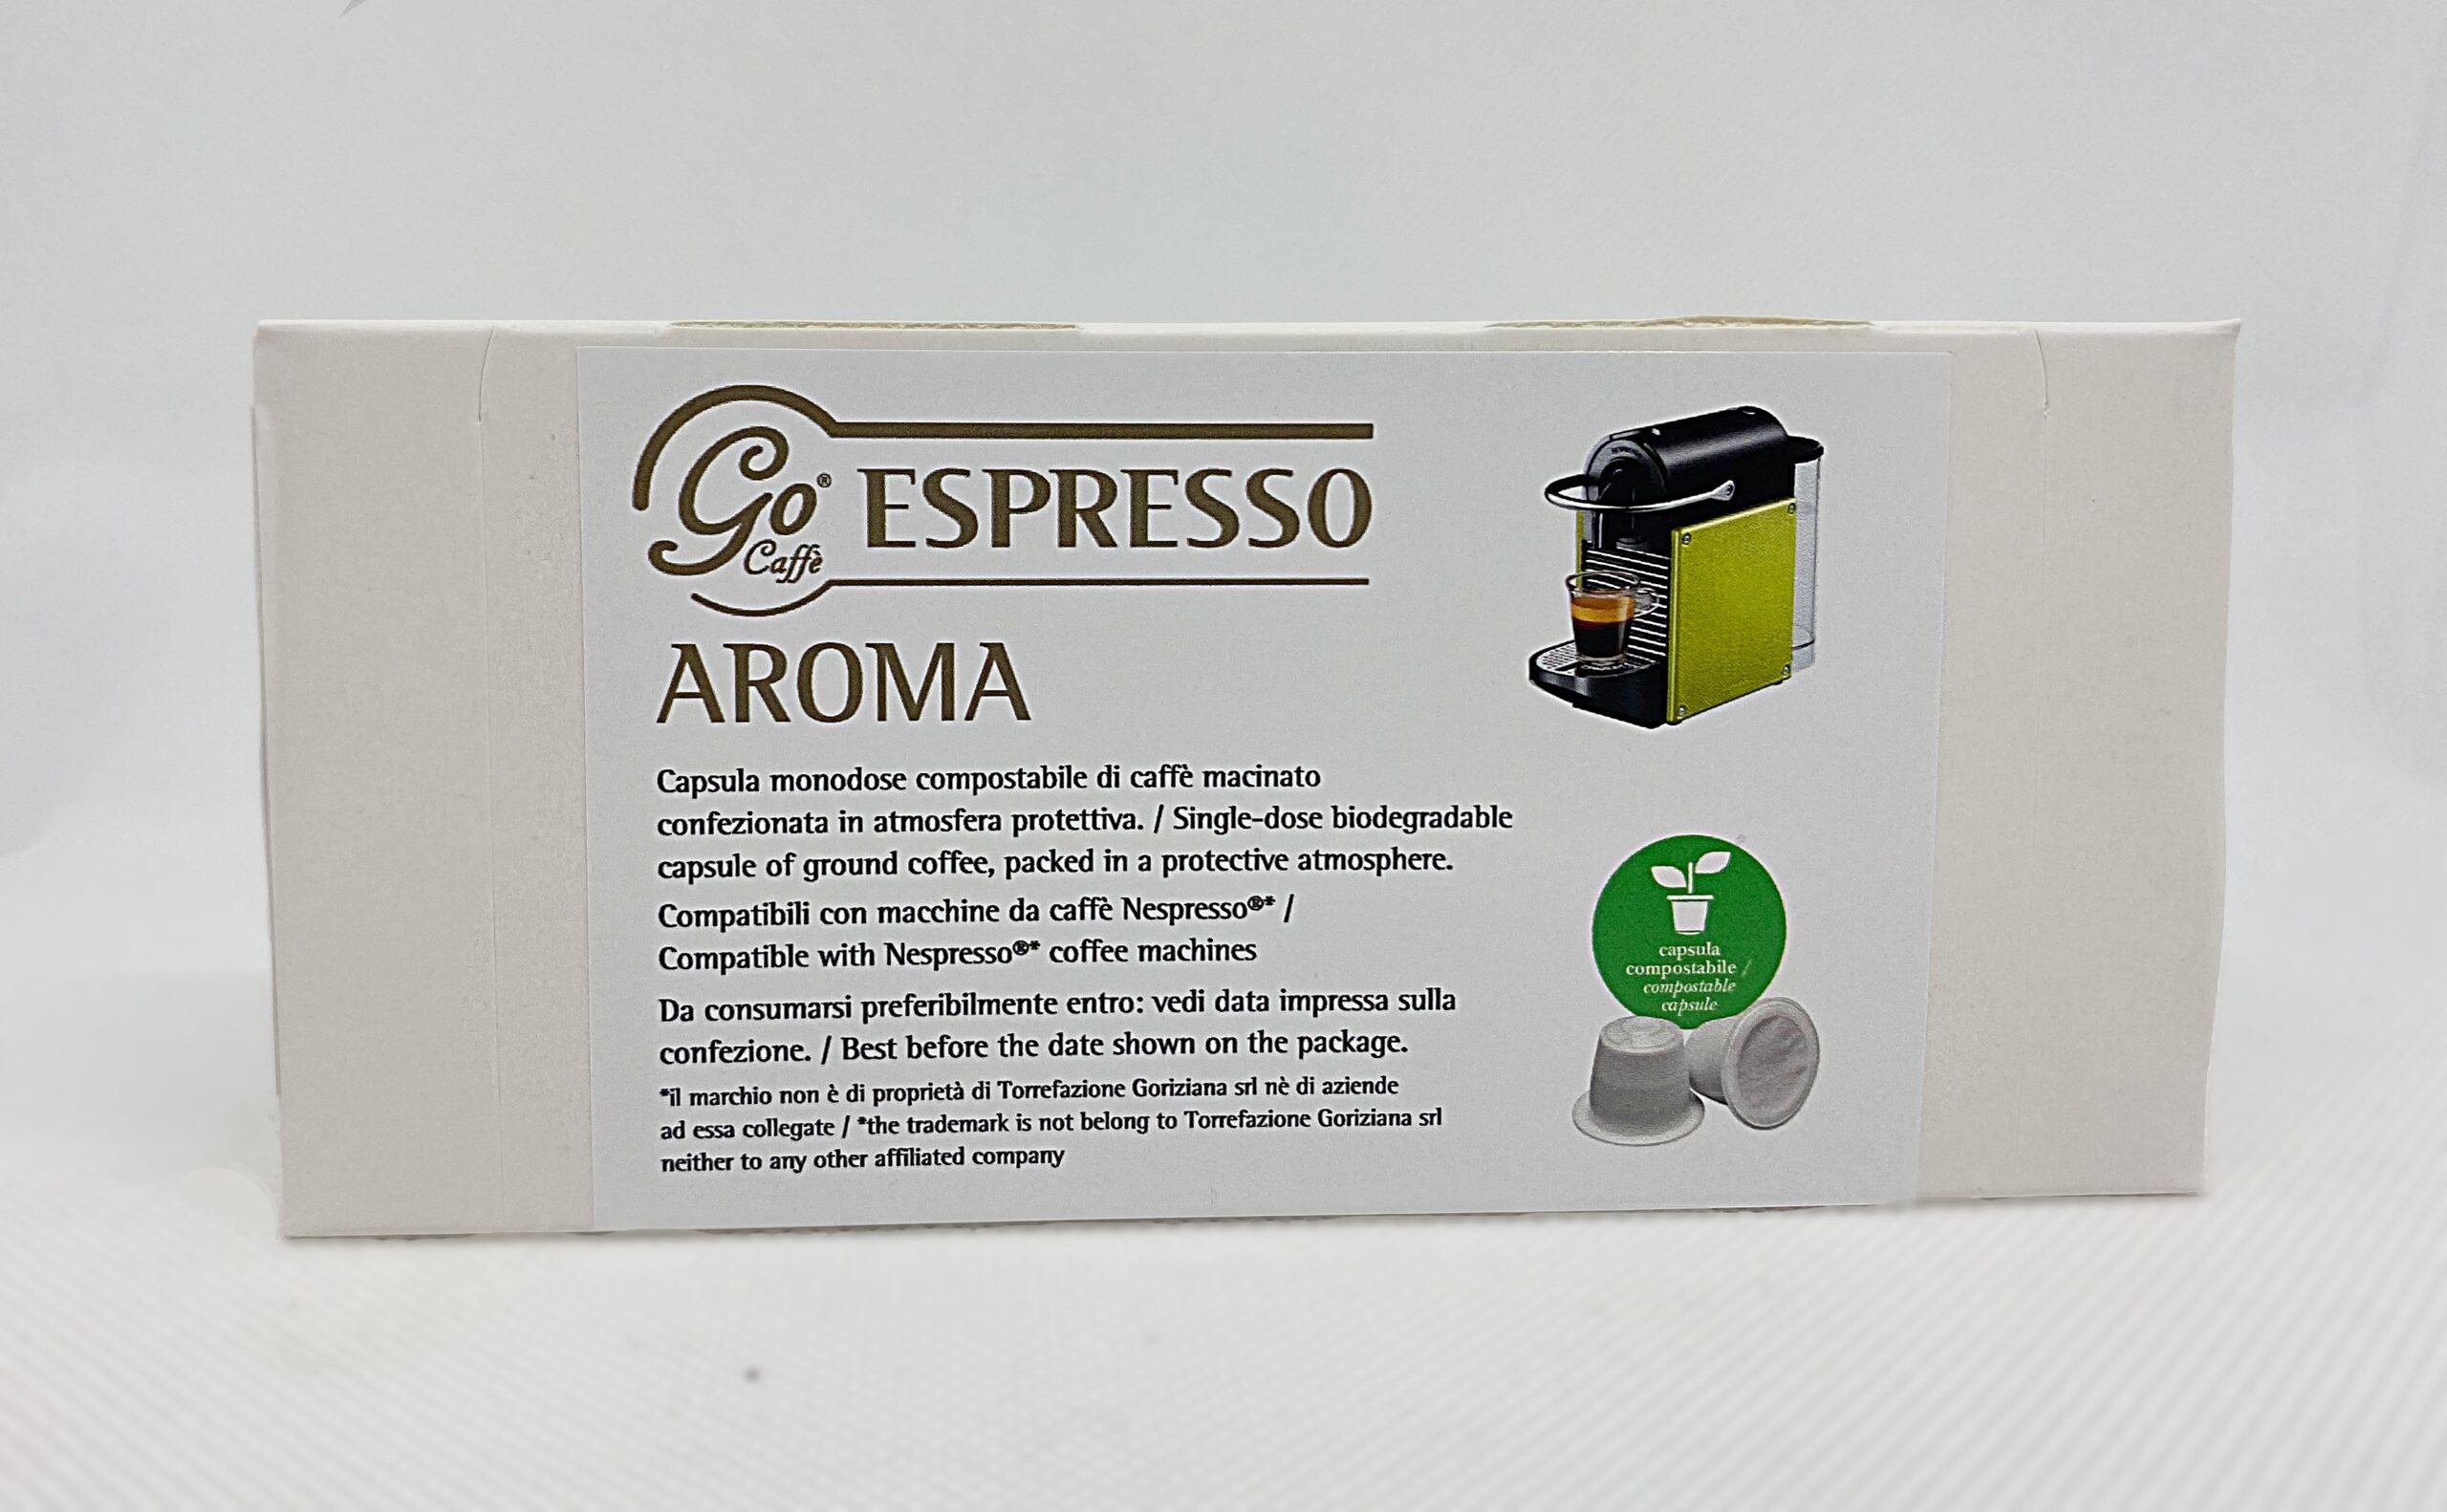 10 CAPSULE GO ESPRESSO AROMA – CAPSULE COMPATIBILI NESPRESSO COMPOSTABILI